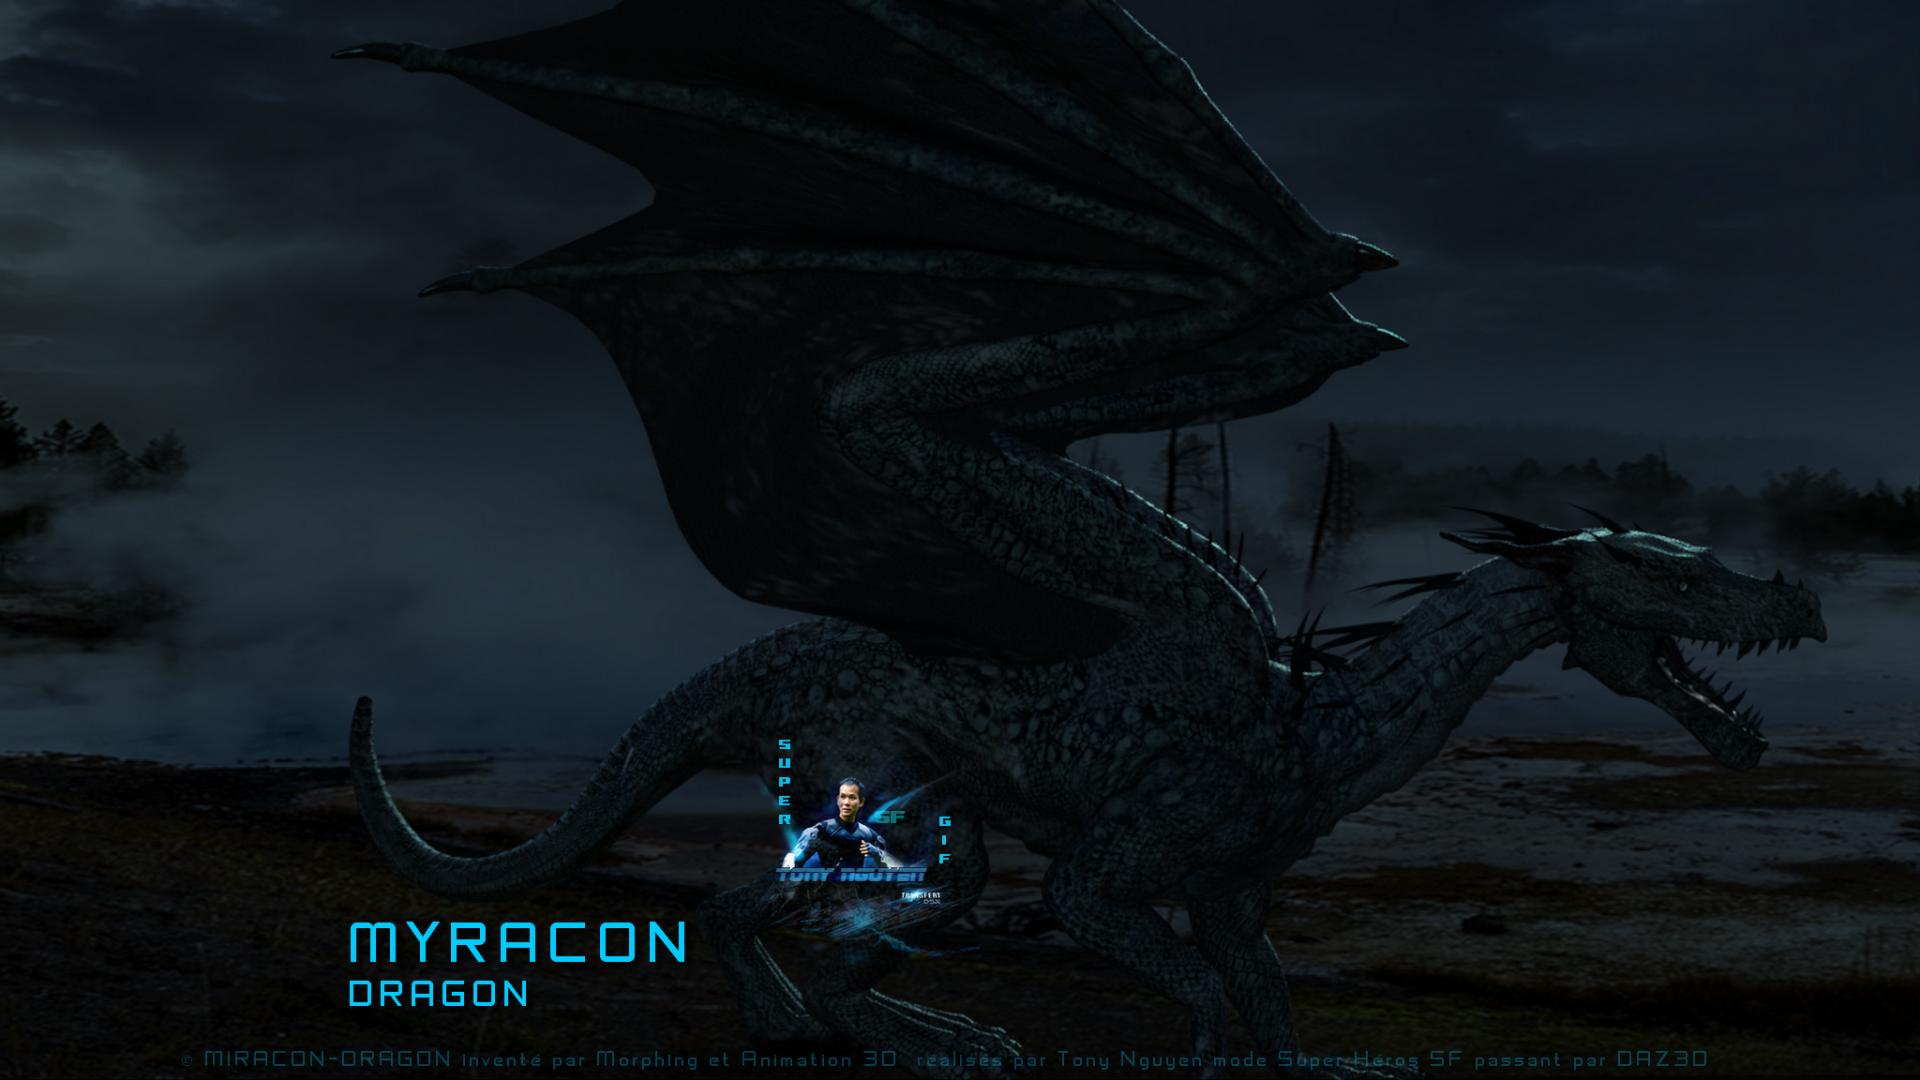 Miracon dragon morphingsurdaz3d inventeepartonynguyensf